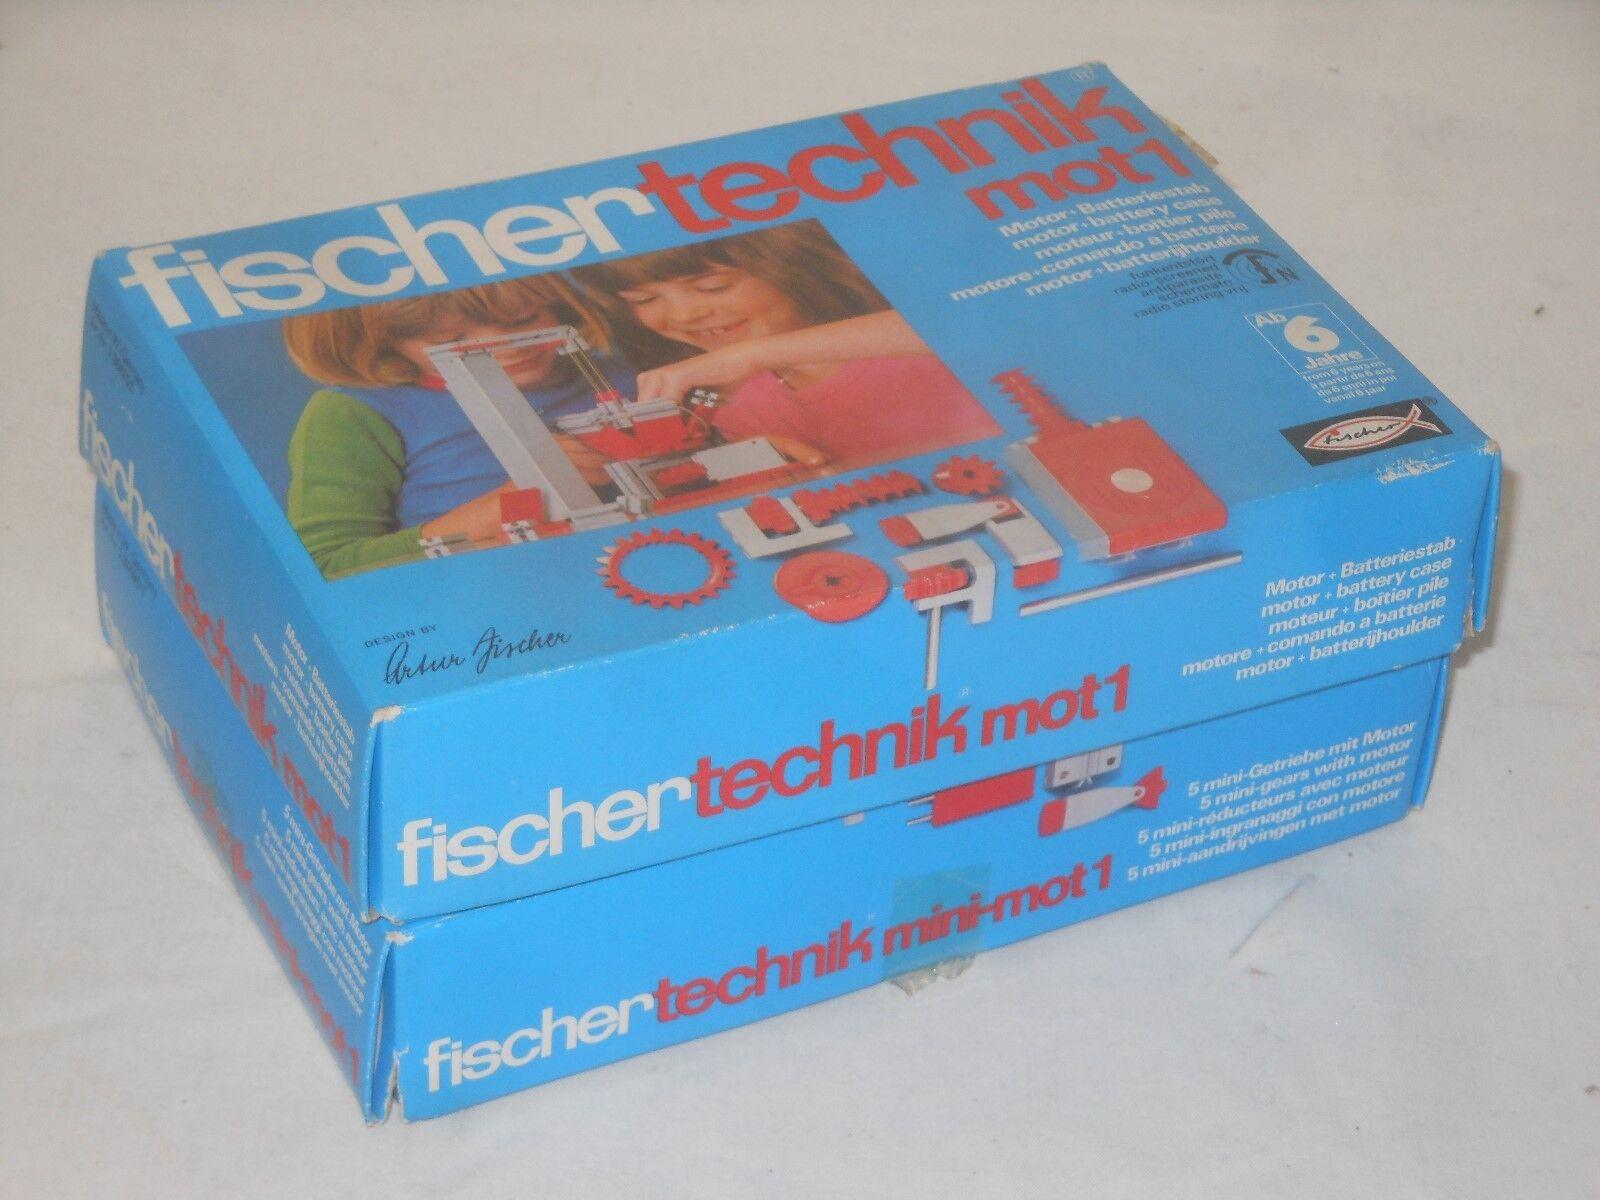 Fischertechnik Lot Sets - mot.1 Motor + Mini - Mot 1 Minimotor + Engranaje - L37